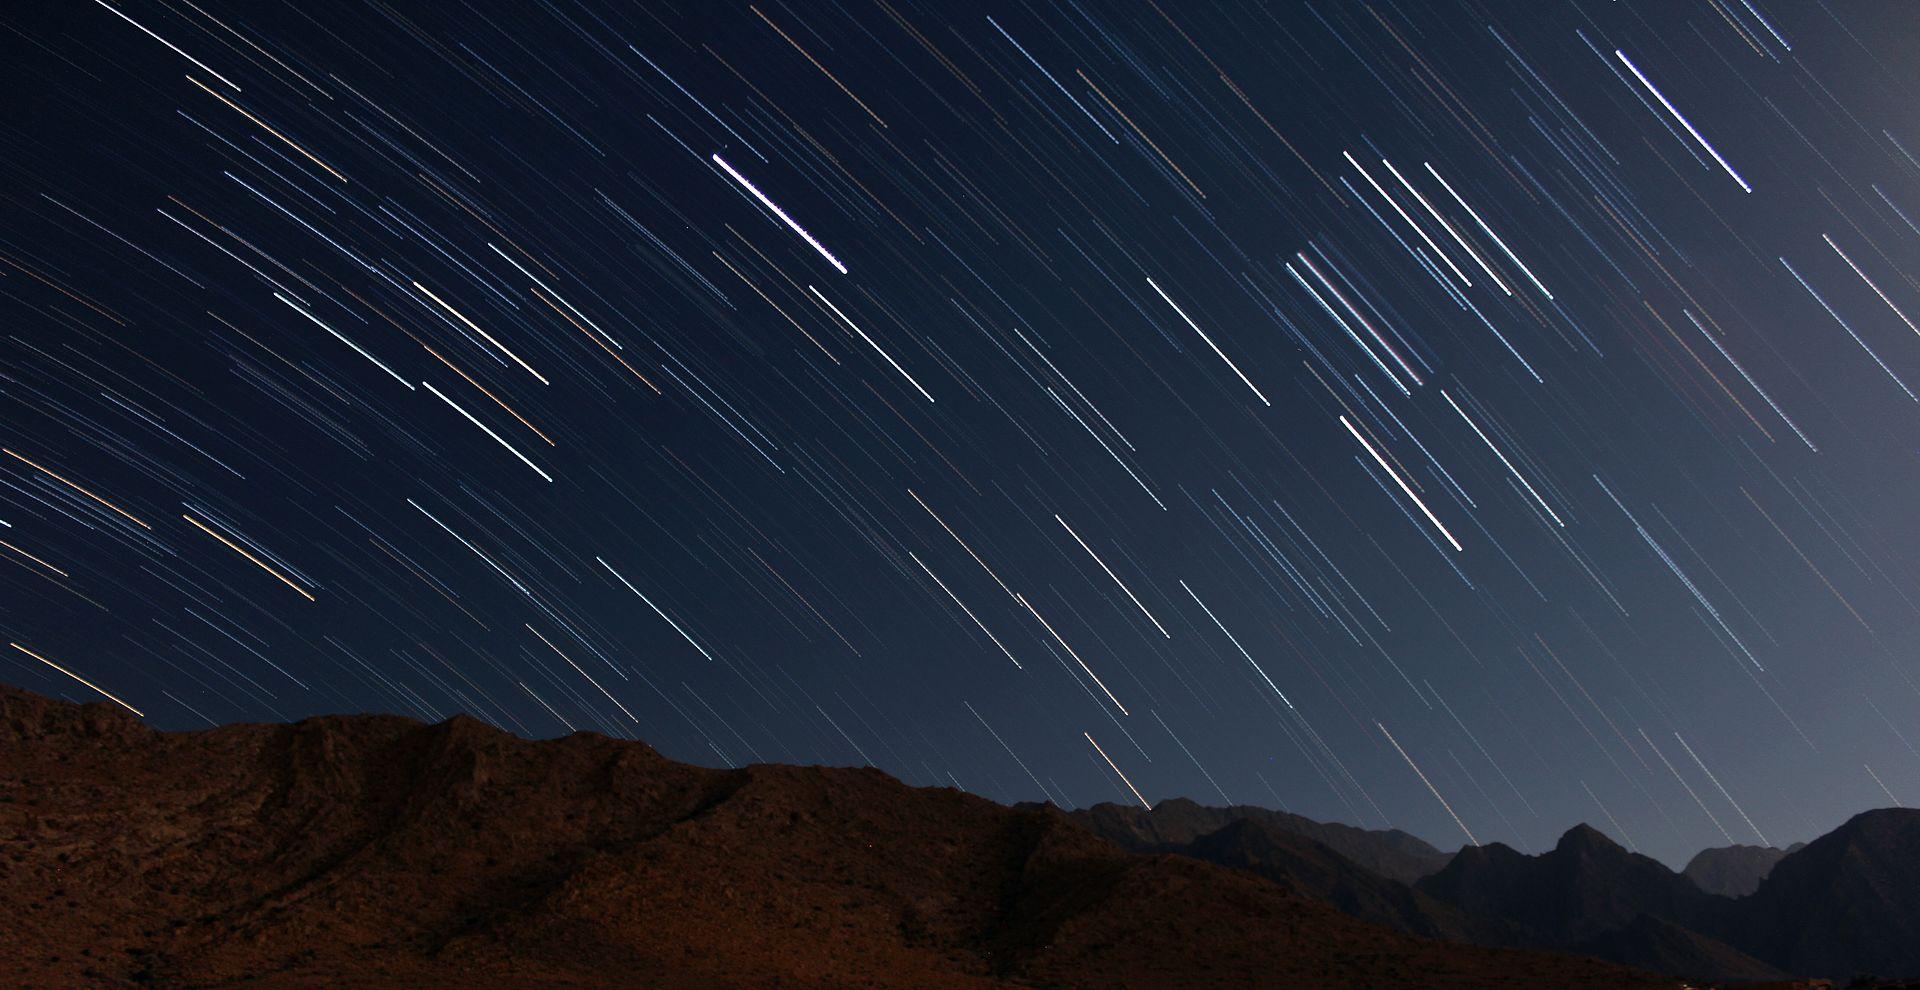 Nachthimmel - Foto: Ahmadreza Sajadi